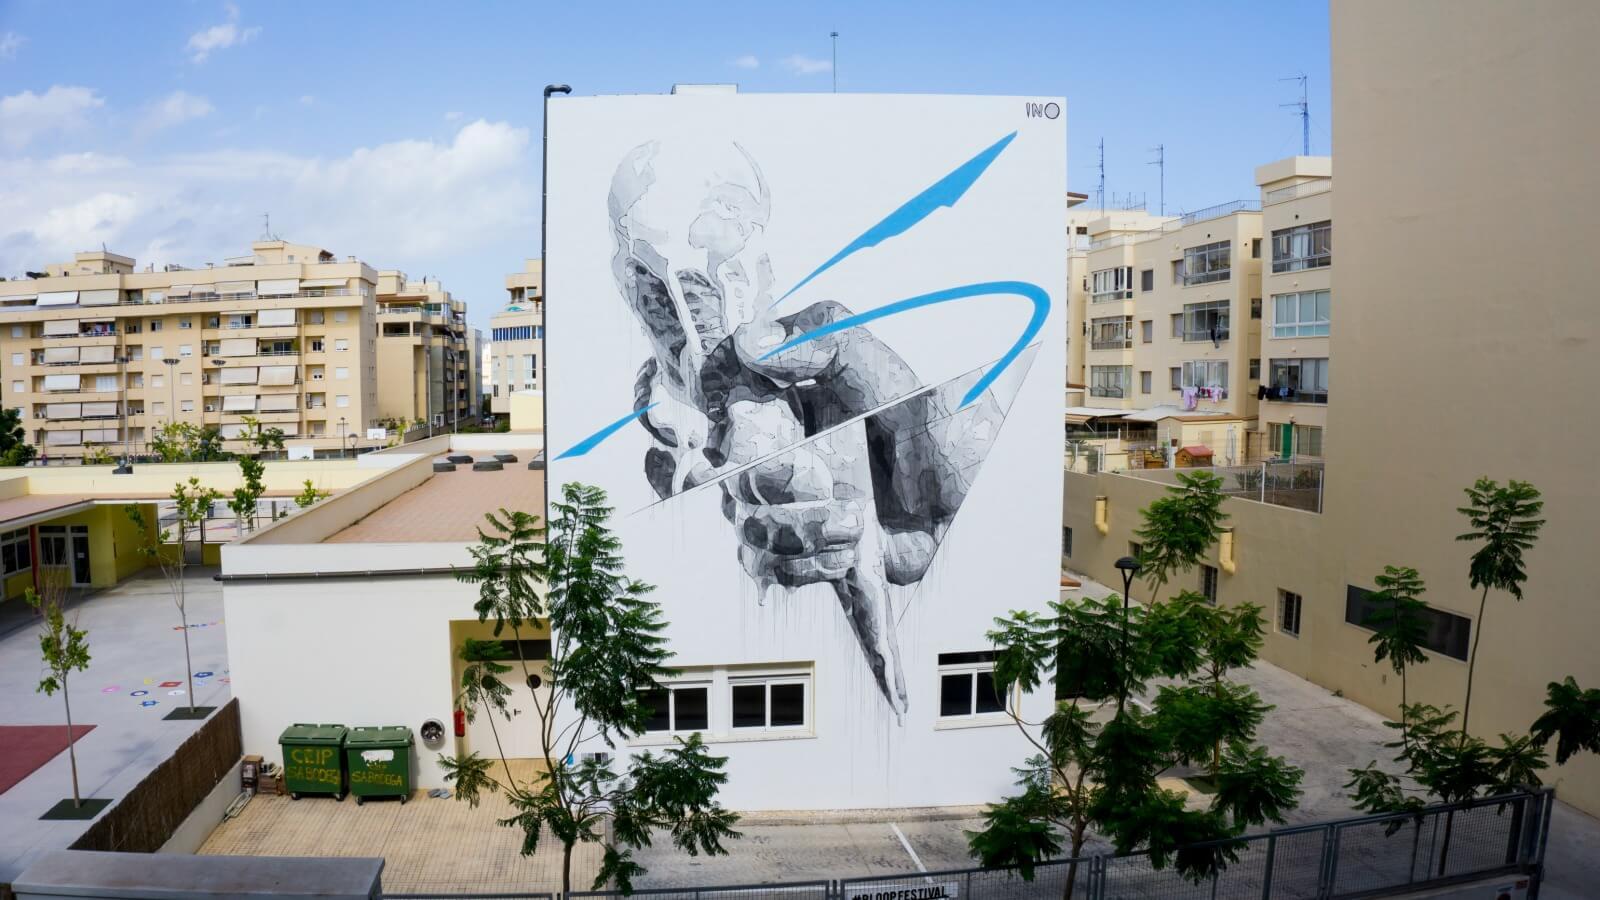 Ino regresa a Bloop Festival pese a la censura por autoridades de Ibiza